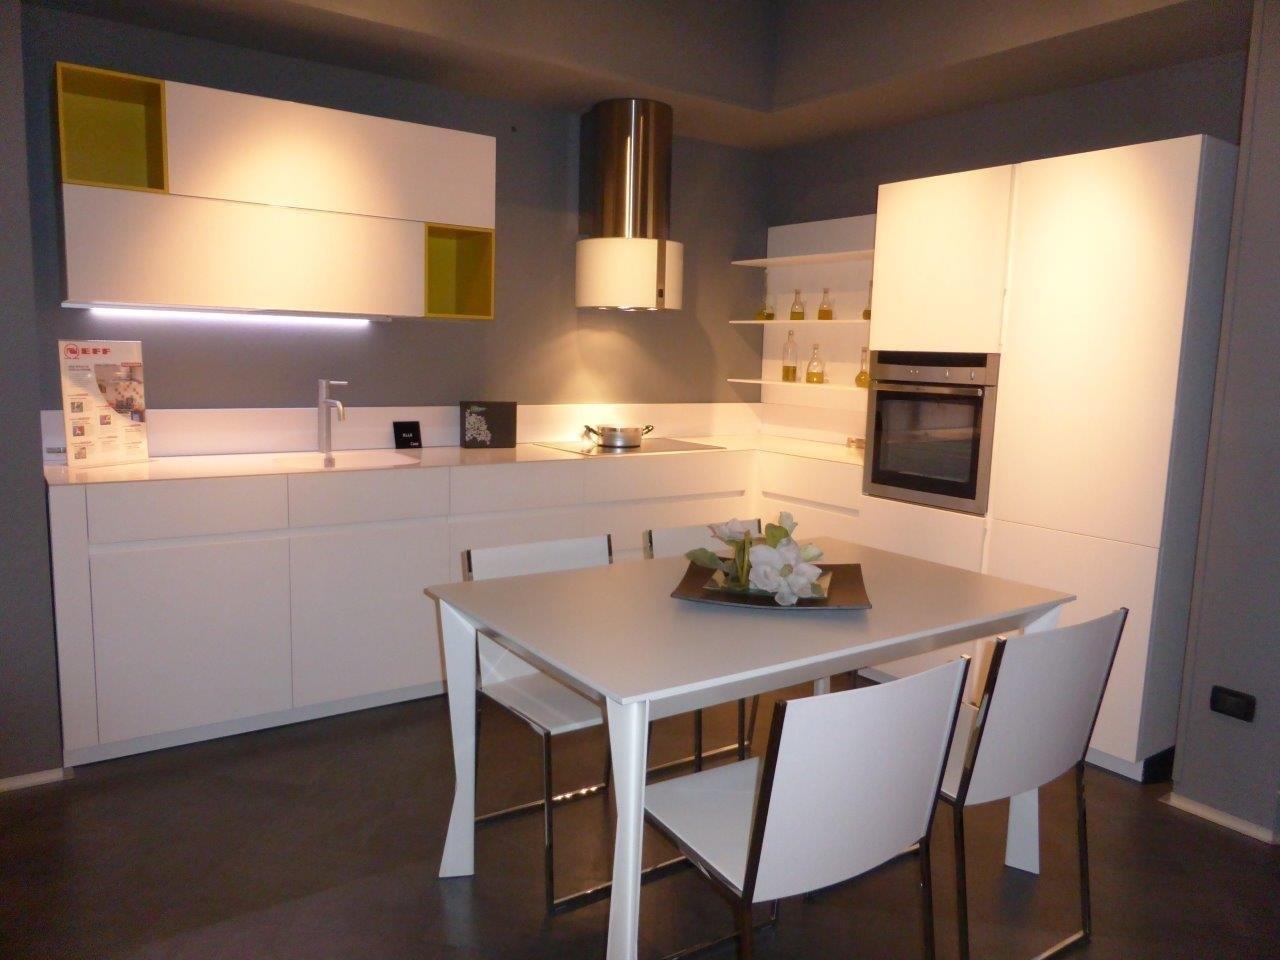 cesar elle kitchens solid door cesar lacquered kitchens kitchen ...